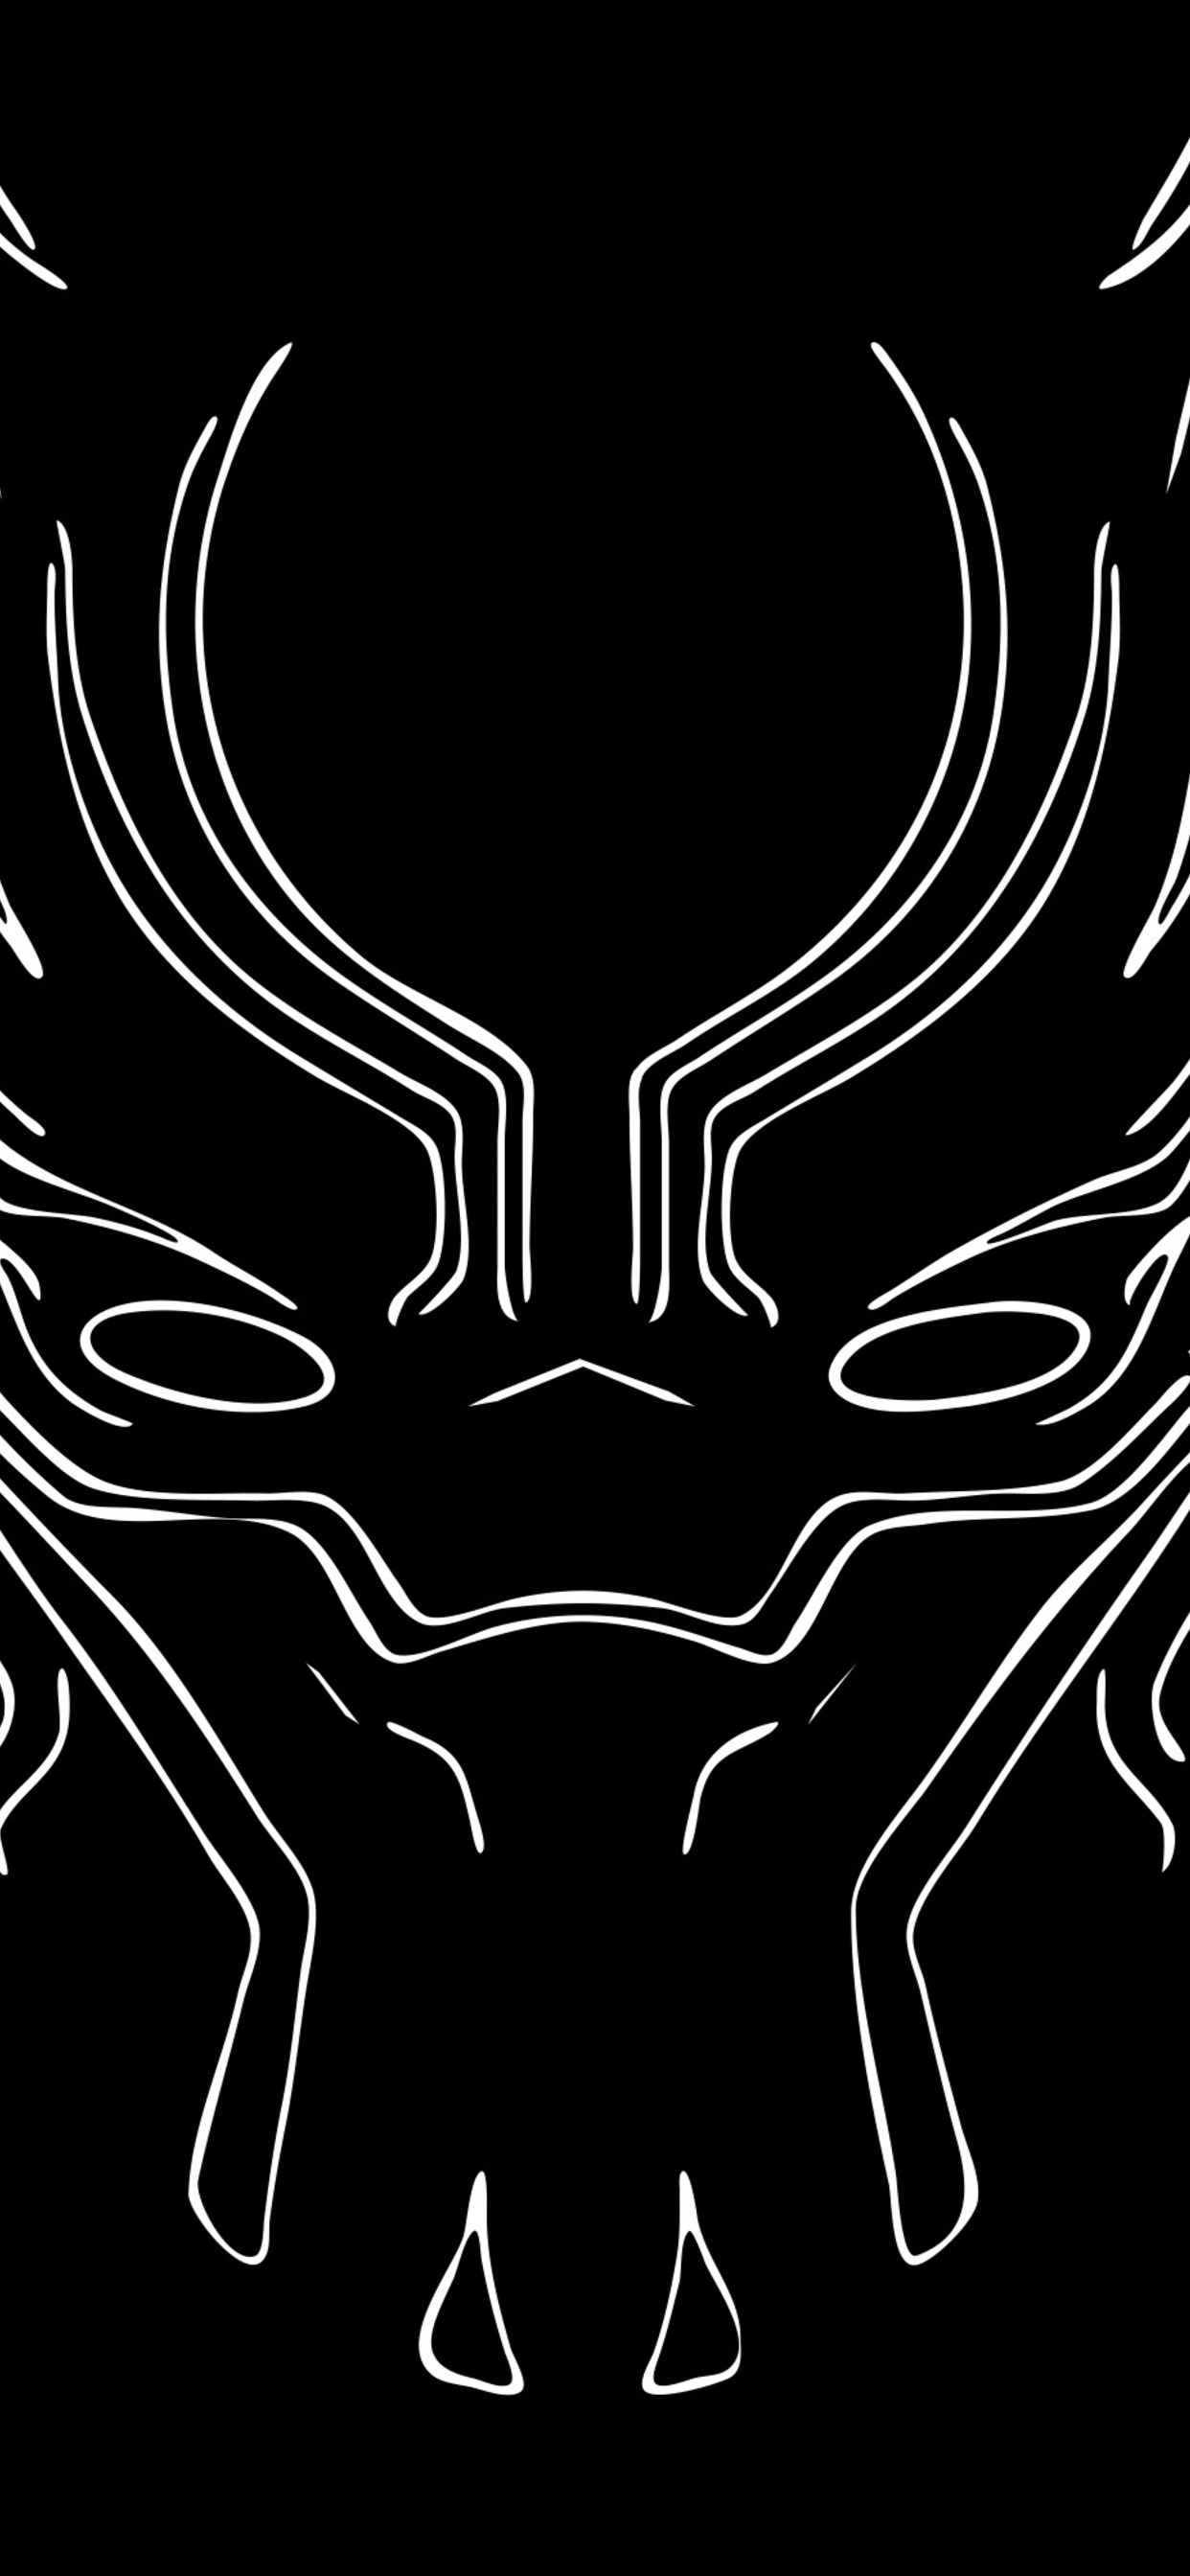 1242x2688 Black Panther 4k Artwork Iphone Xs Max Hd 4k